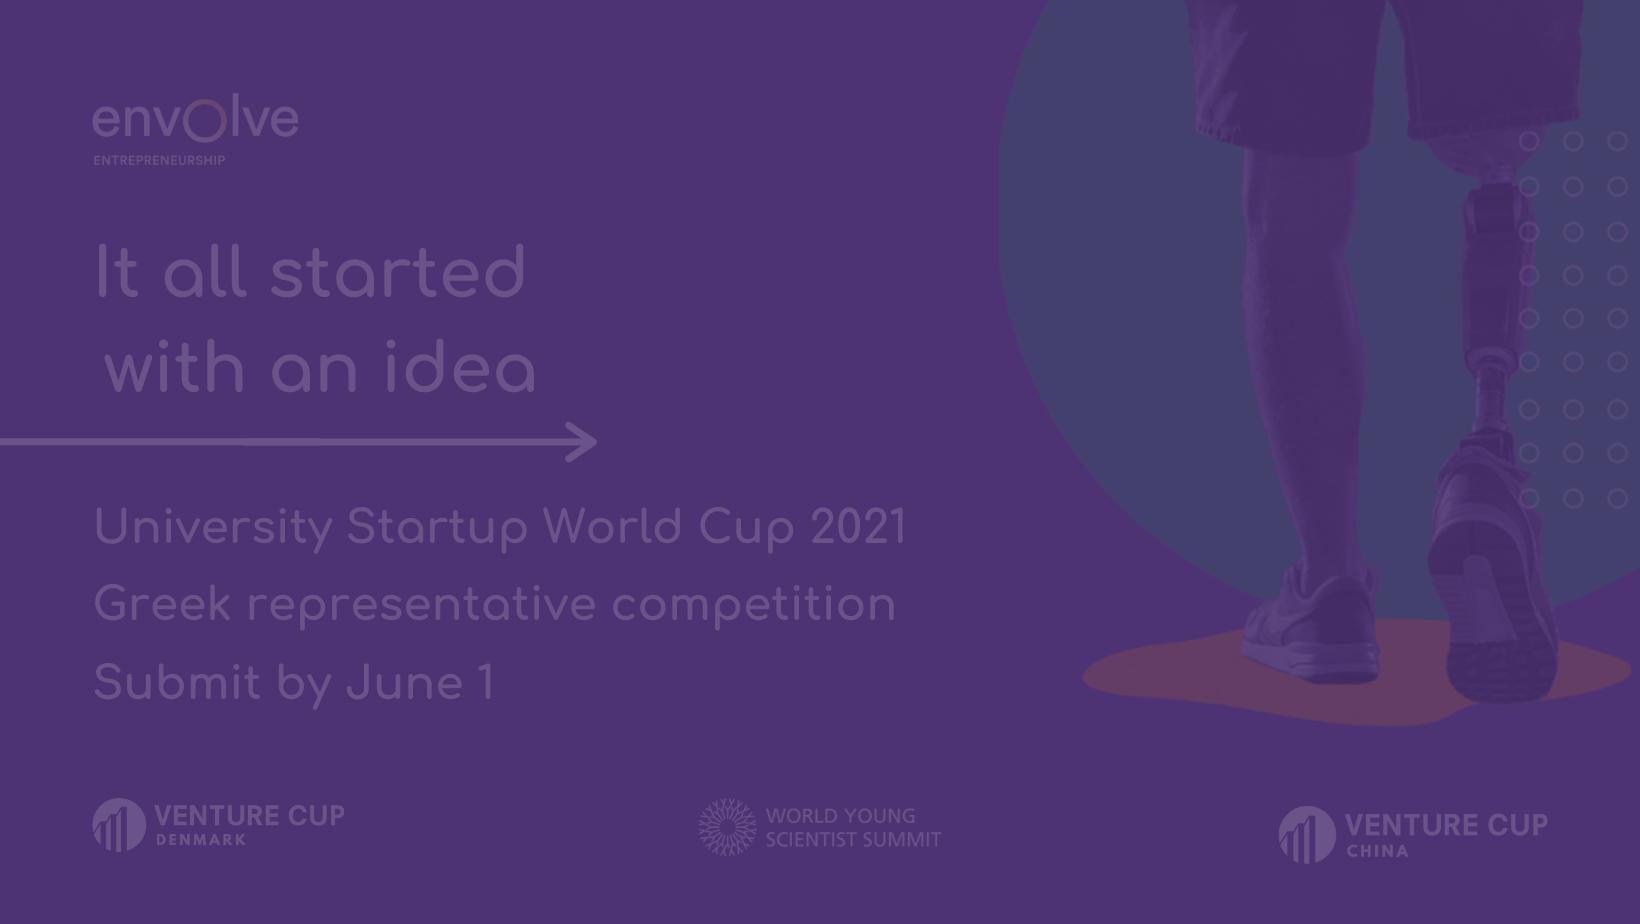 University Startup World Cup 2021 – Η ανάδειξη της Ελληνικής εκπροσώπησης θα γίνει από το Envolve Entrepreneurship